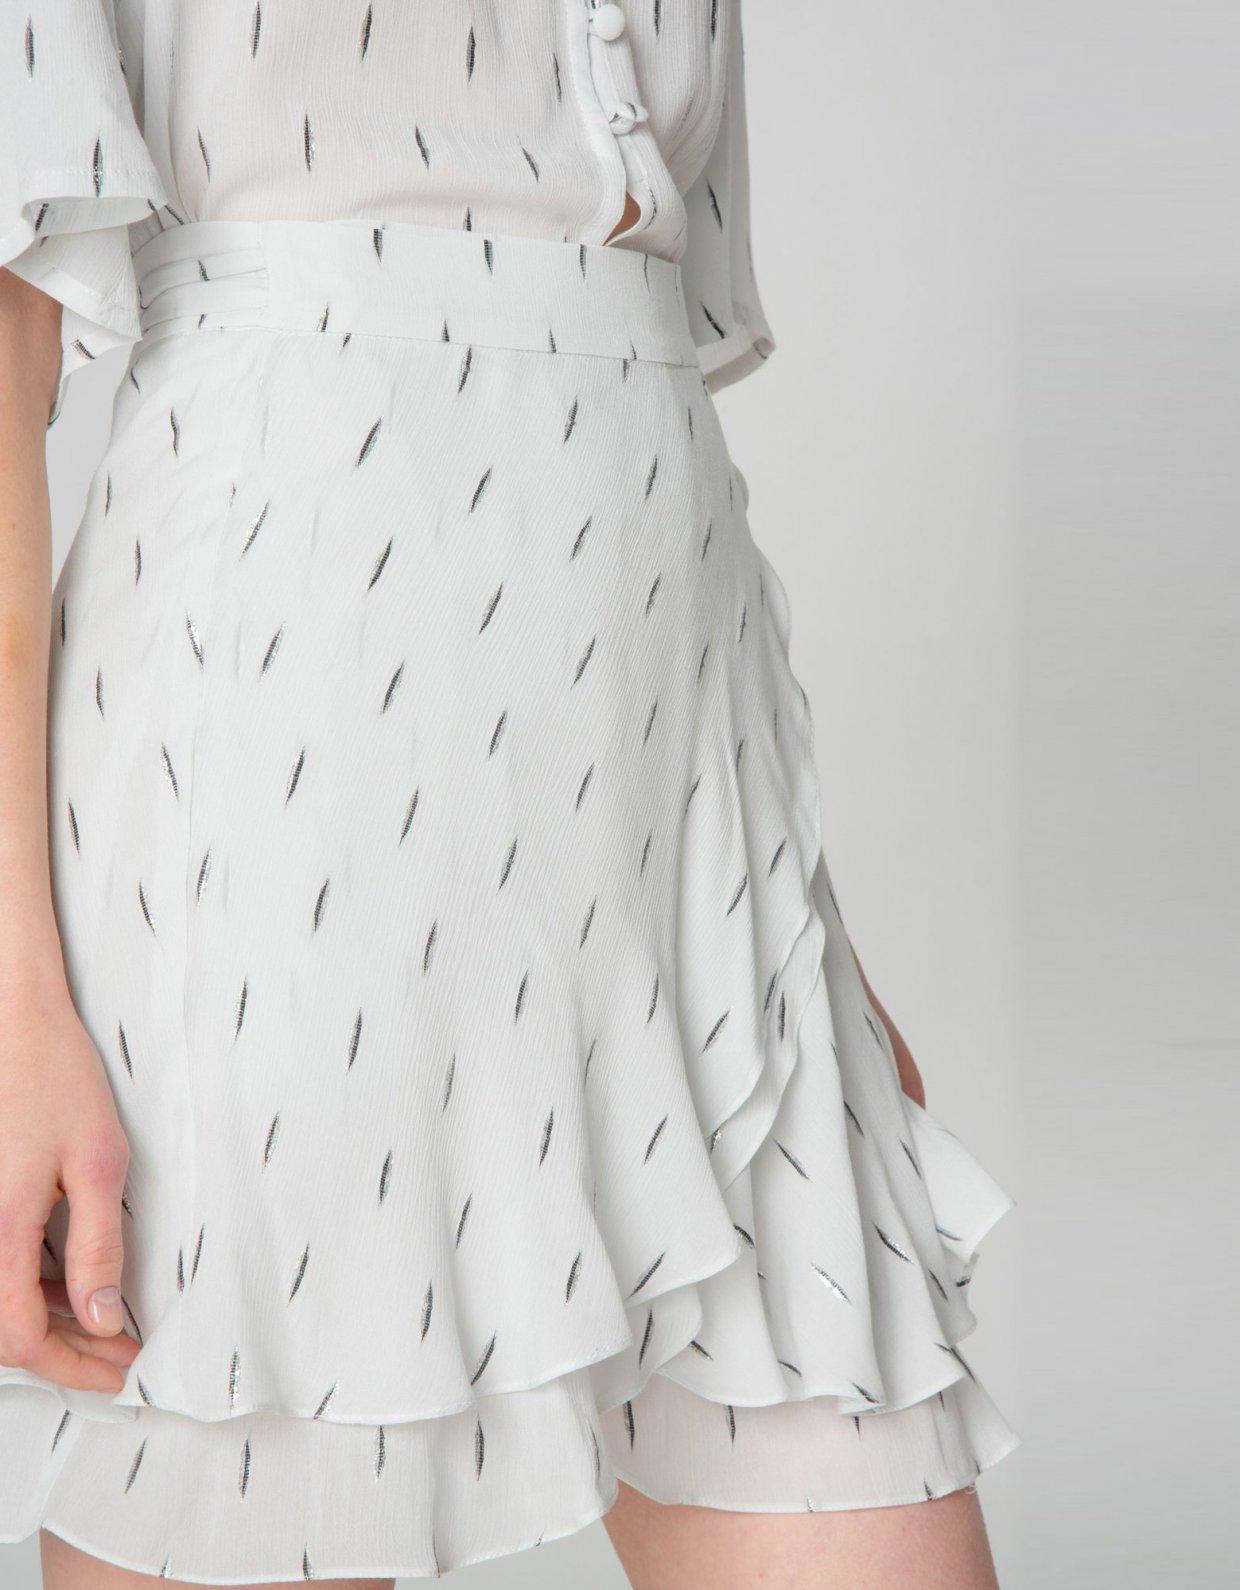 Nadia Rapti Pearl of Africa skirt white